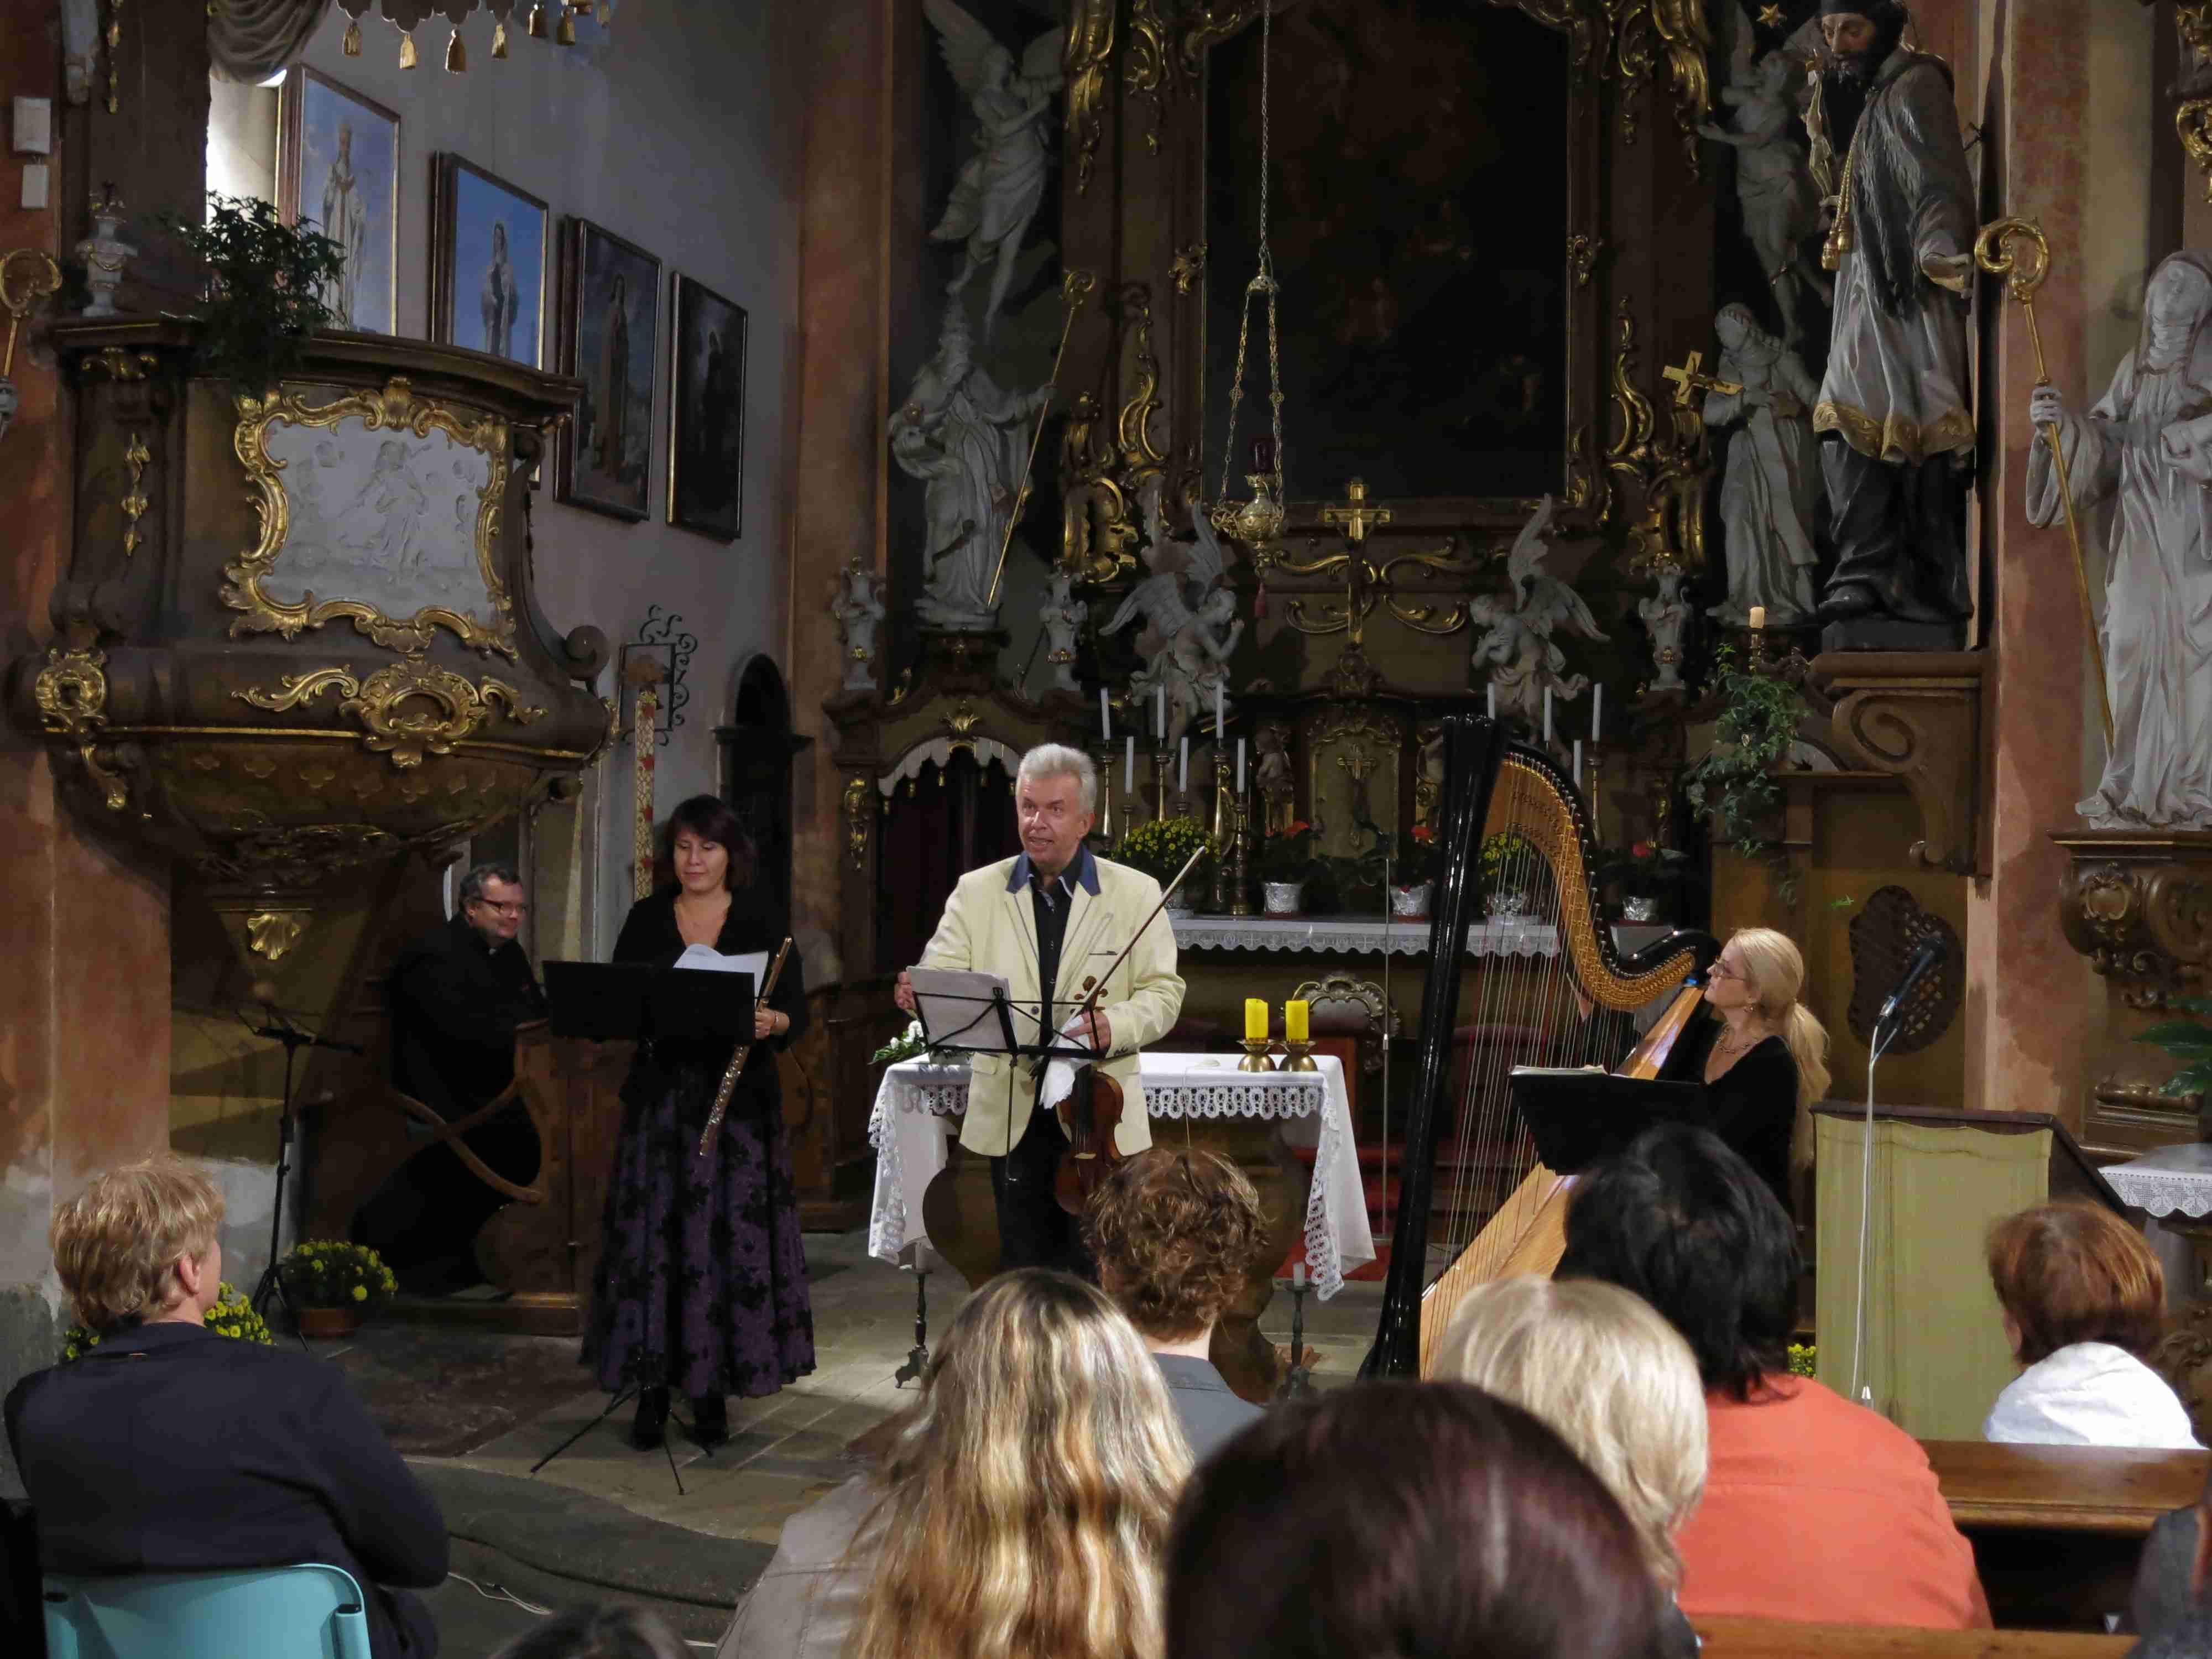 pouť ke sv. Františku 2014 - koncert - 1